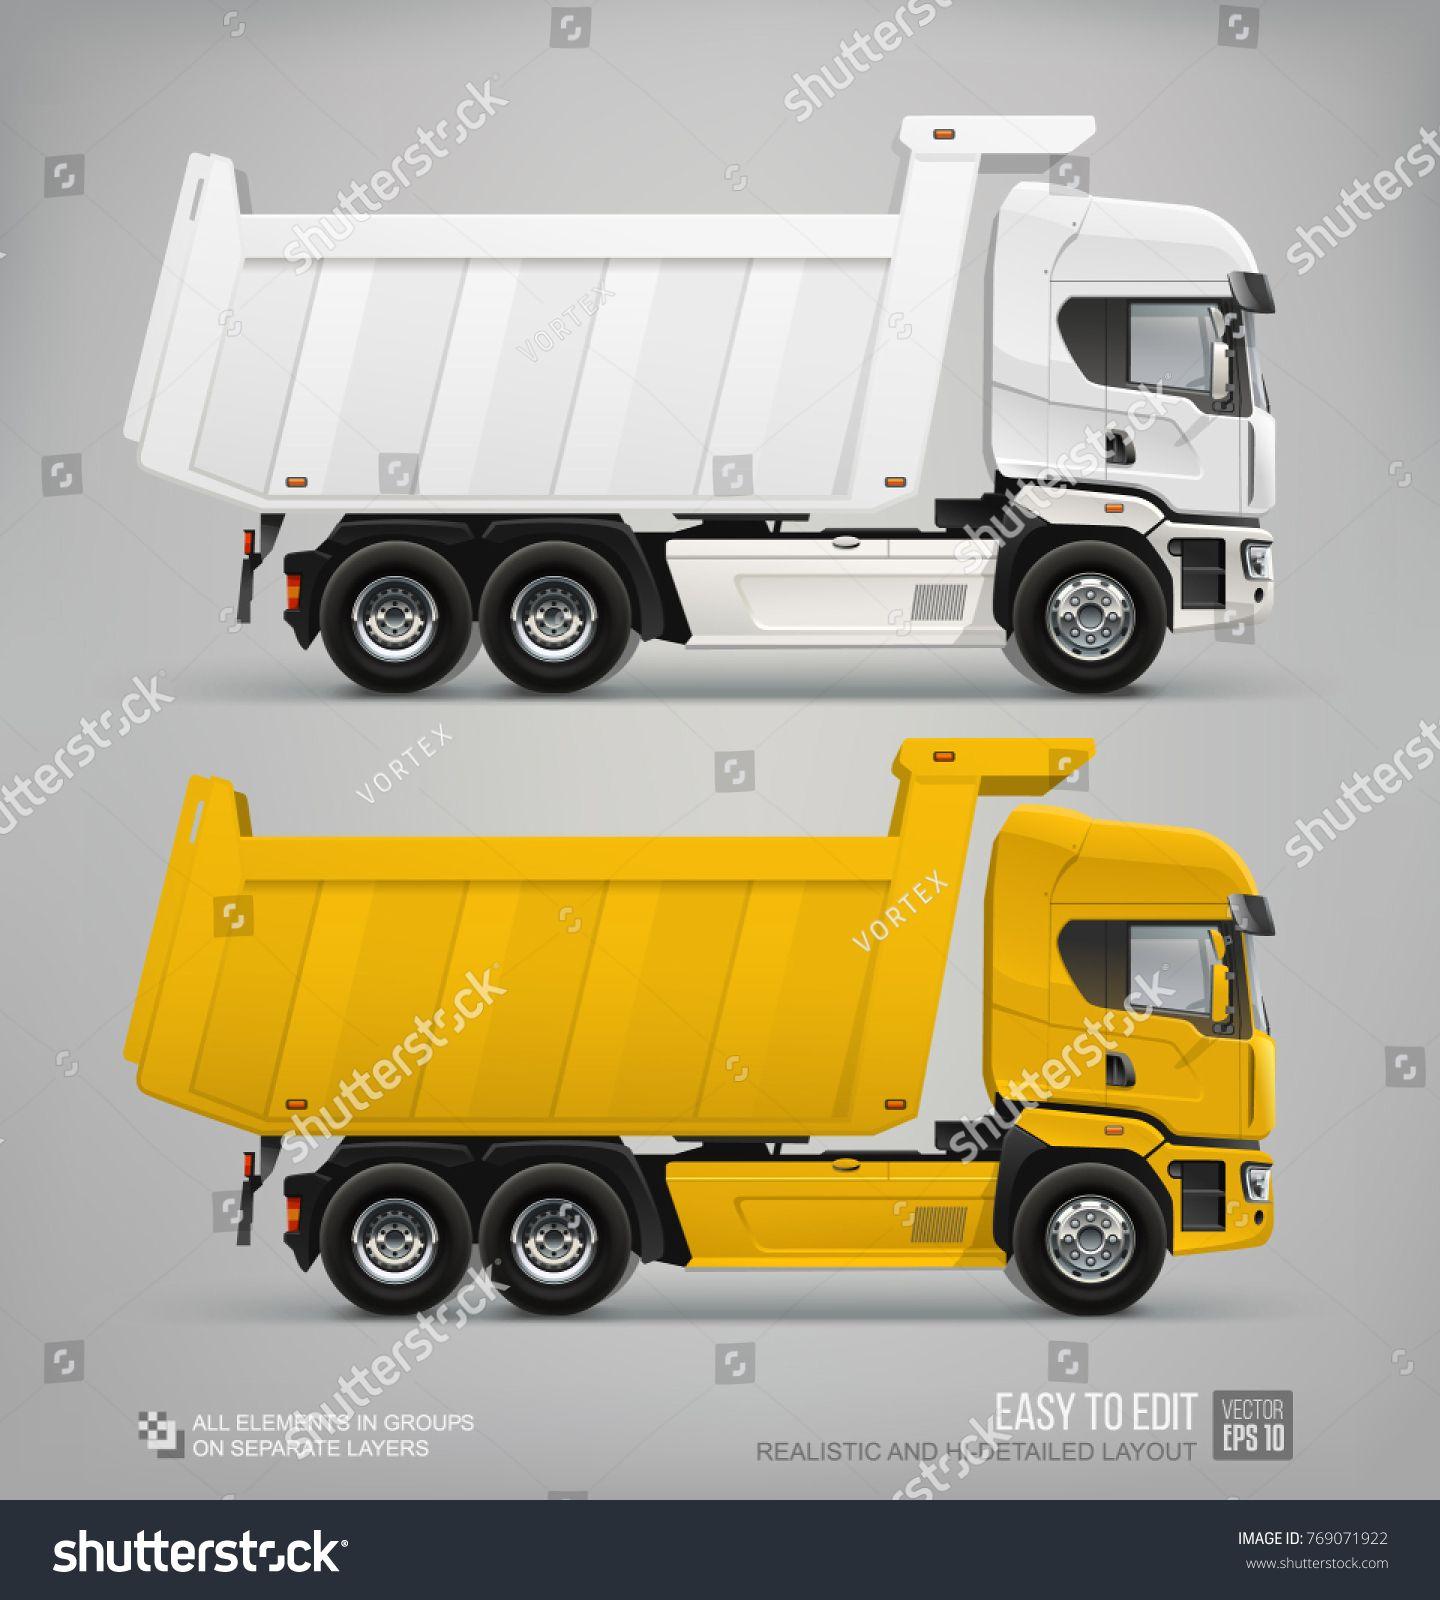 Realistic Dump Truck Vector Template White And Yellow Cargo Dump Truck Industrial Dumper Vehicle Mockuptemplate White Yellow Vecto Trucks Dump Truck Vehicles